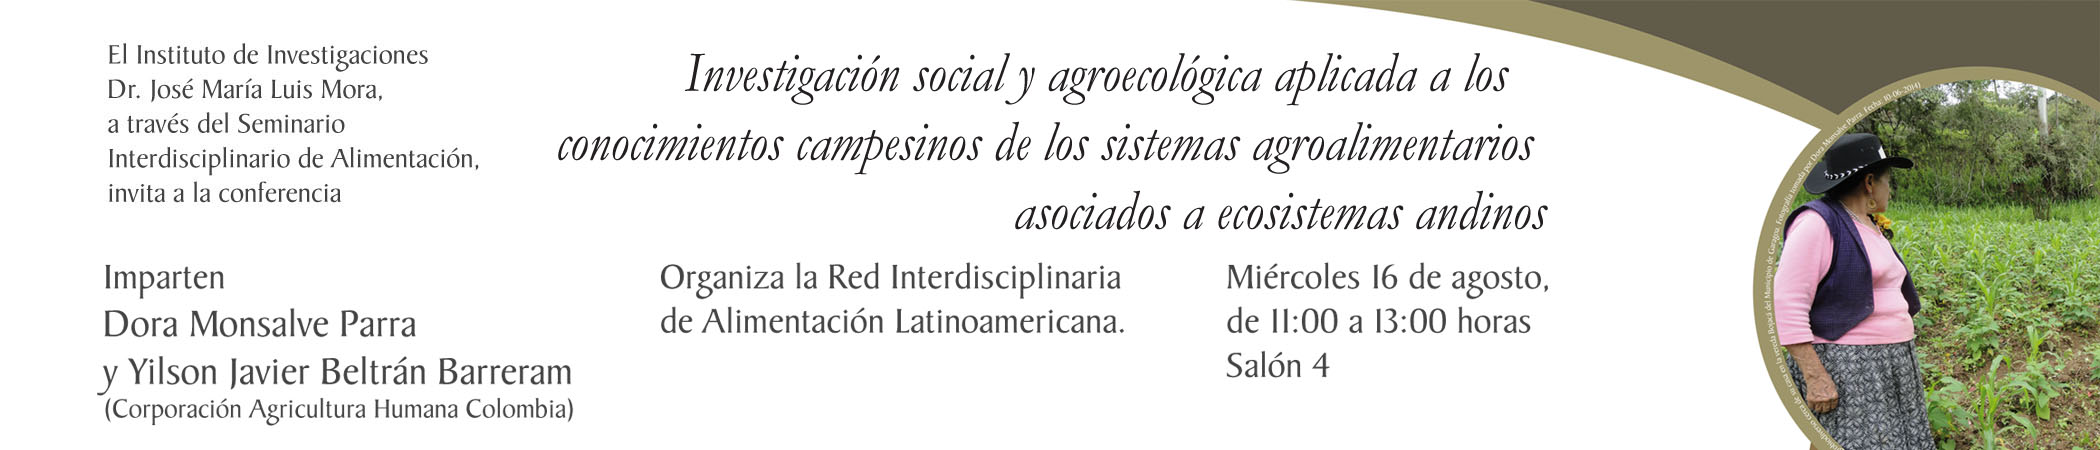 Seminario Interdisciplinario de Alimentación